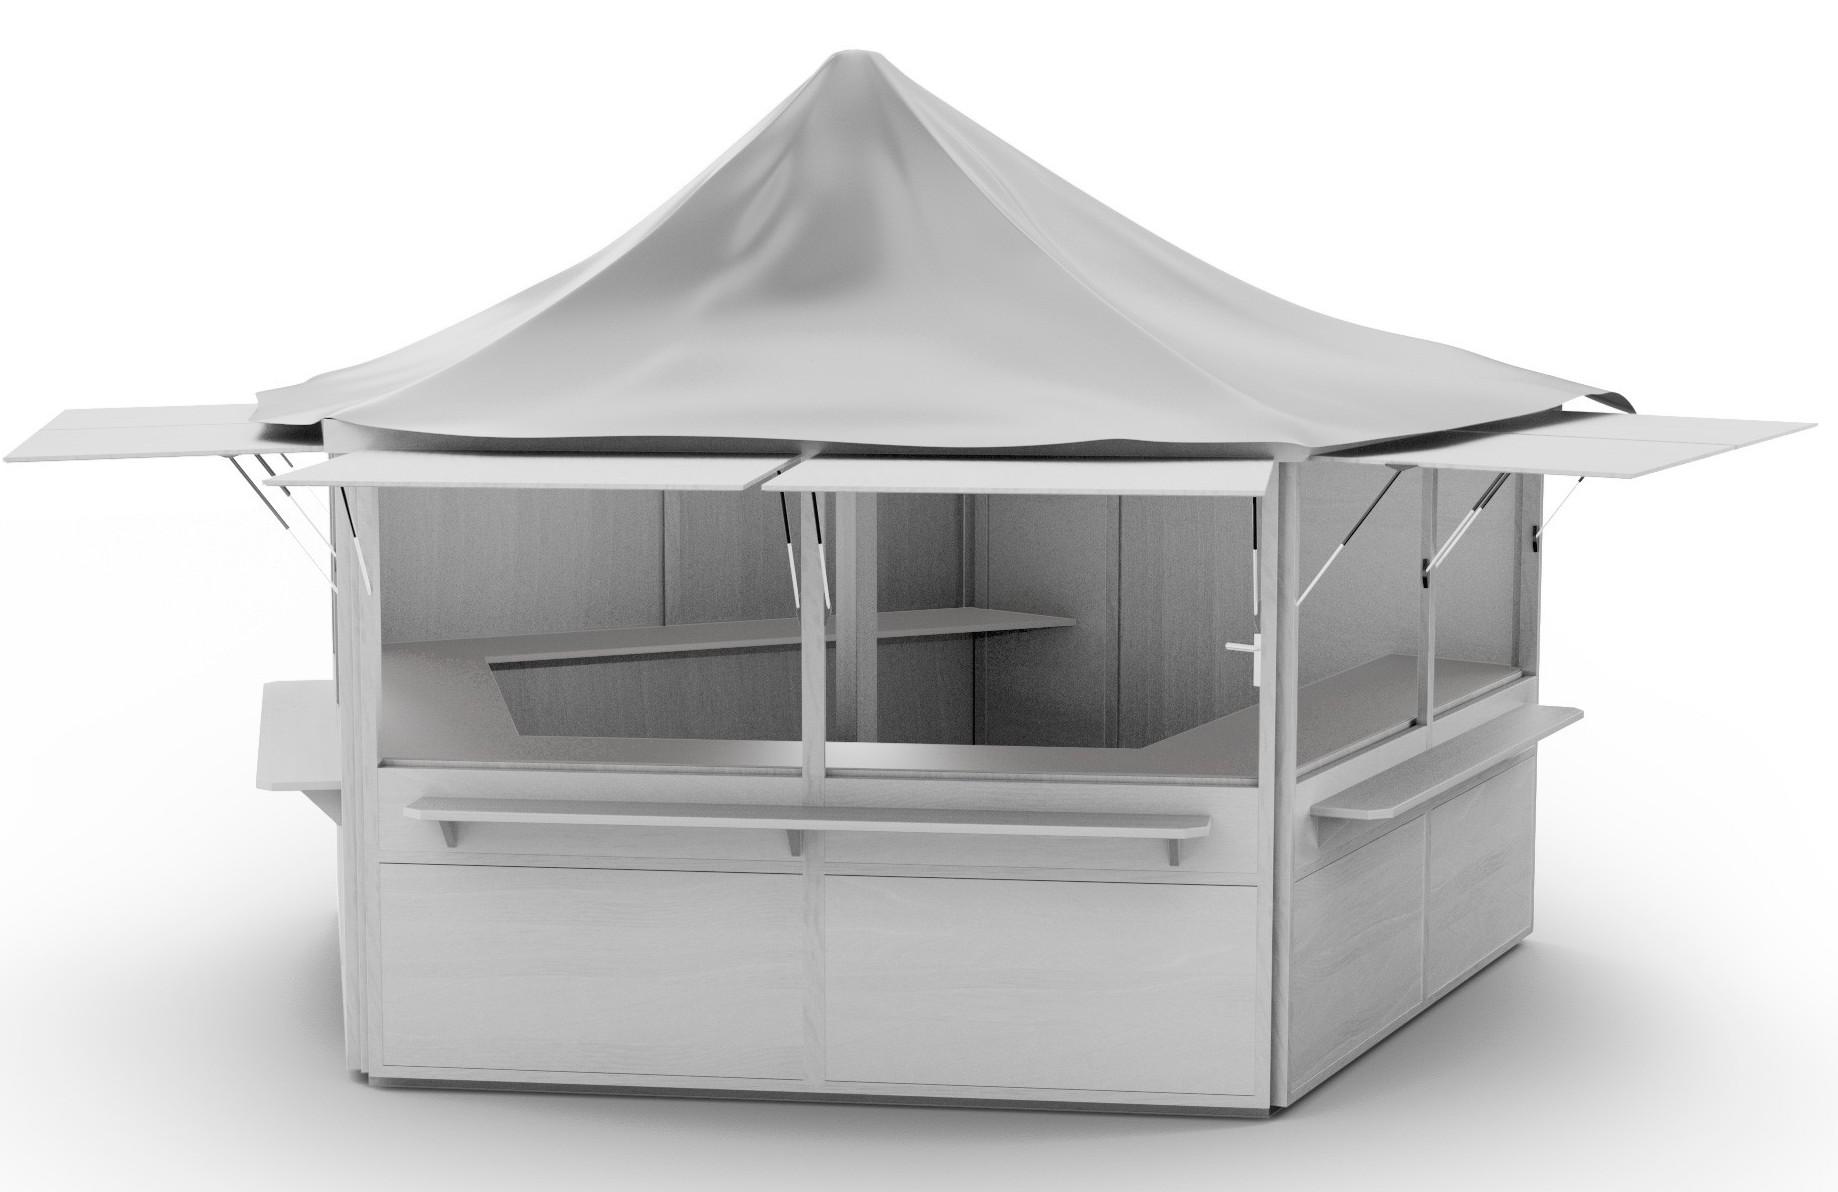 Pavillon weiß Front